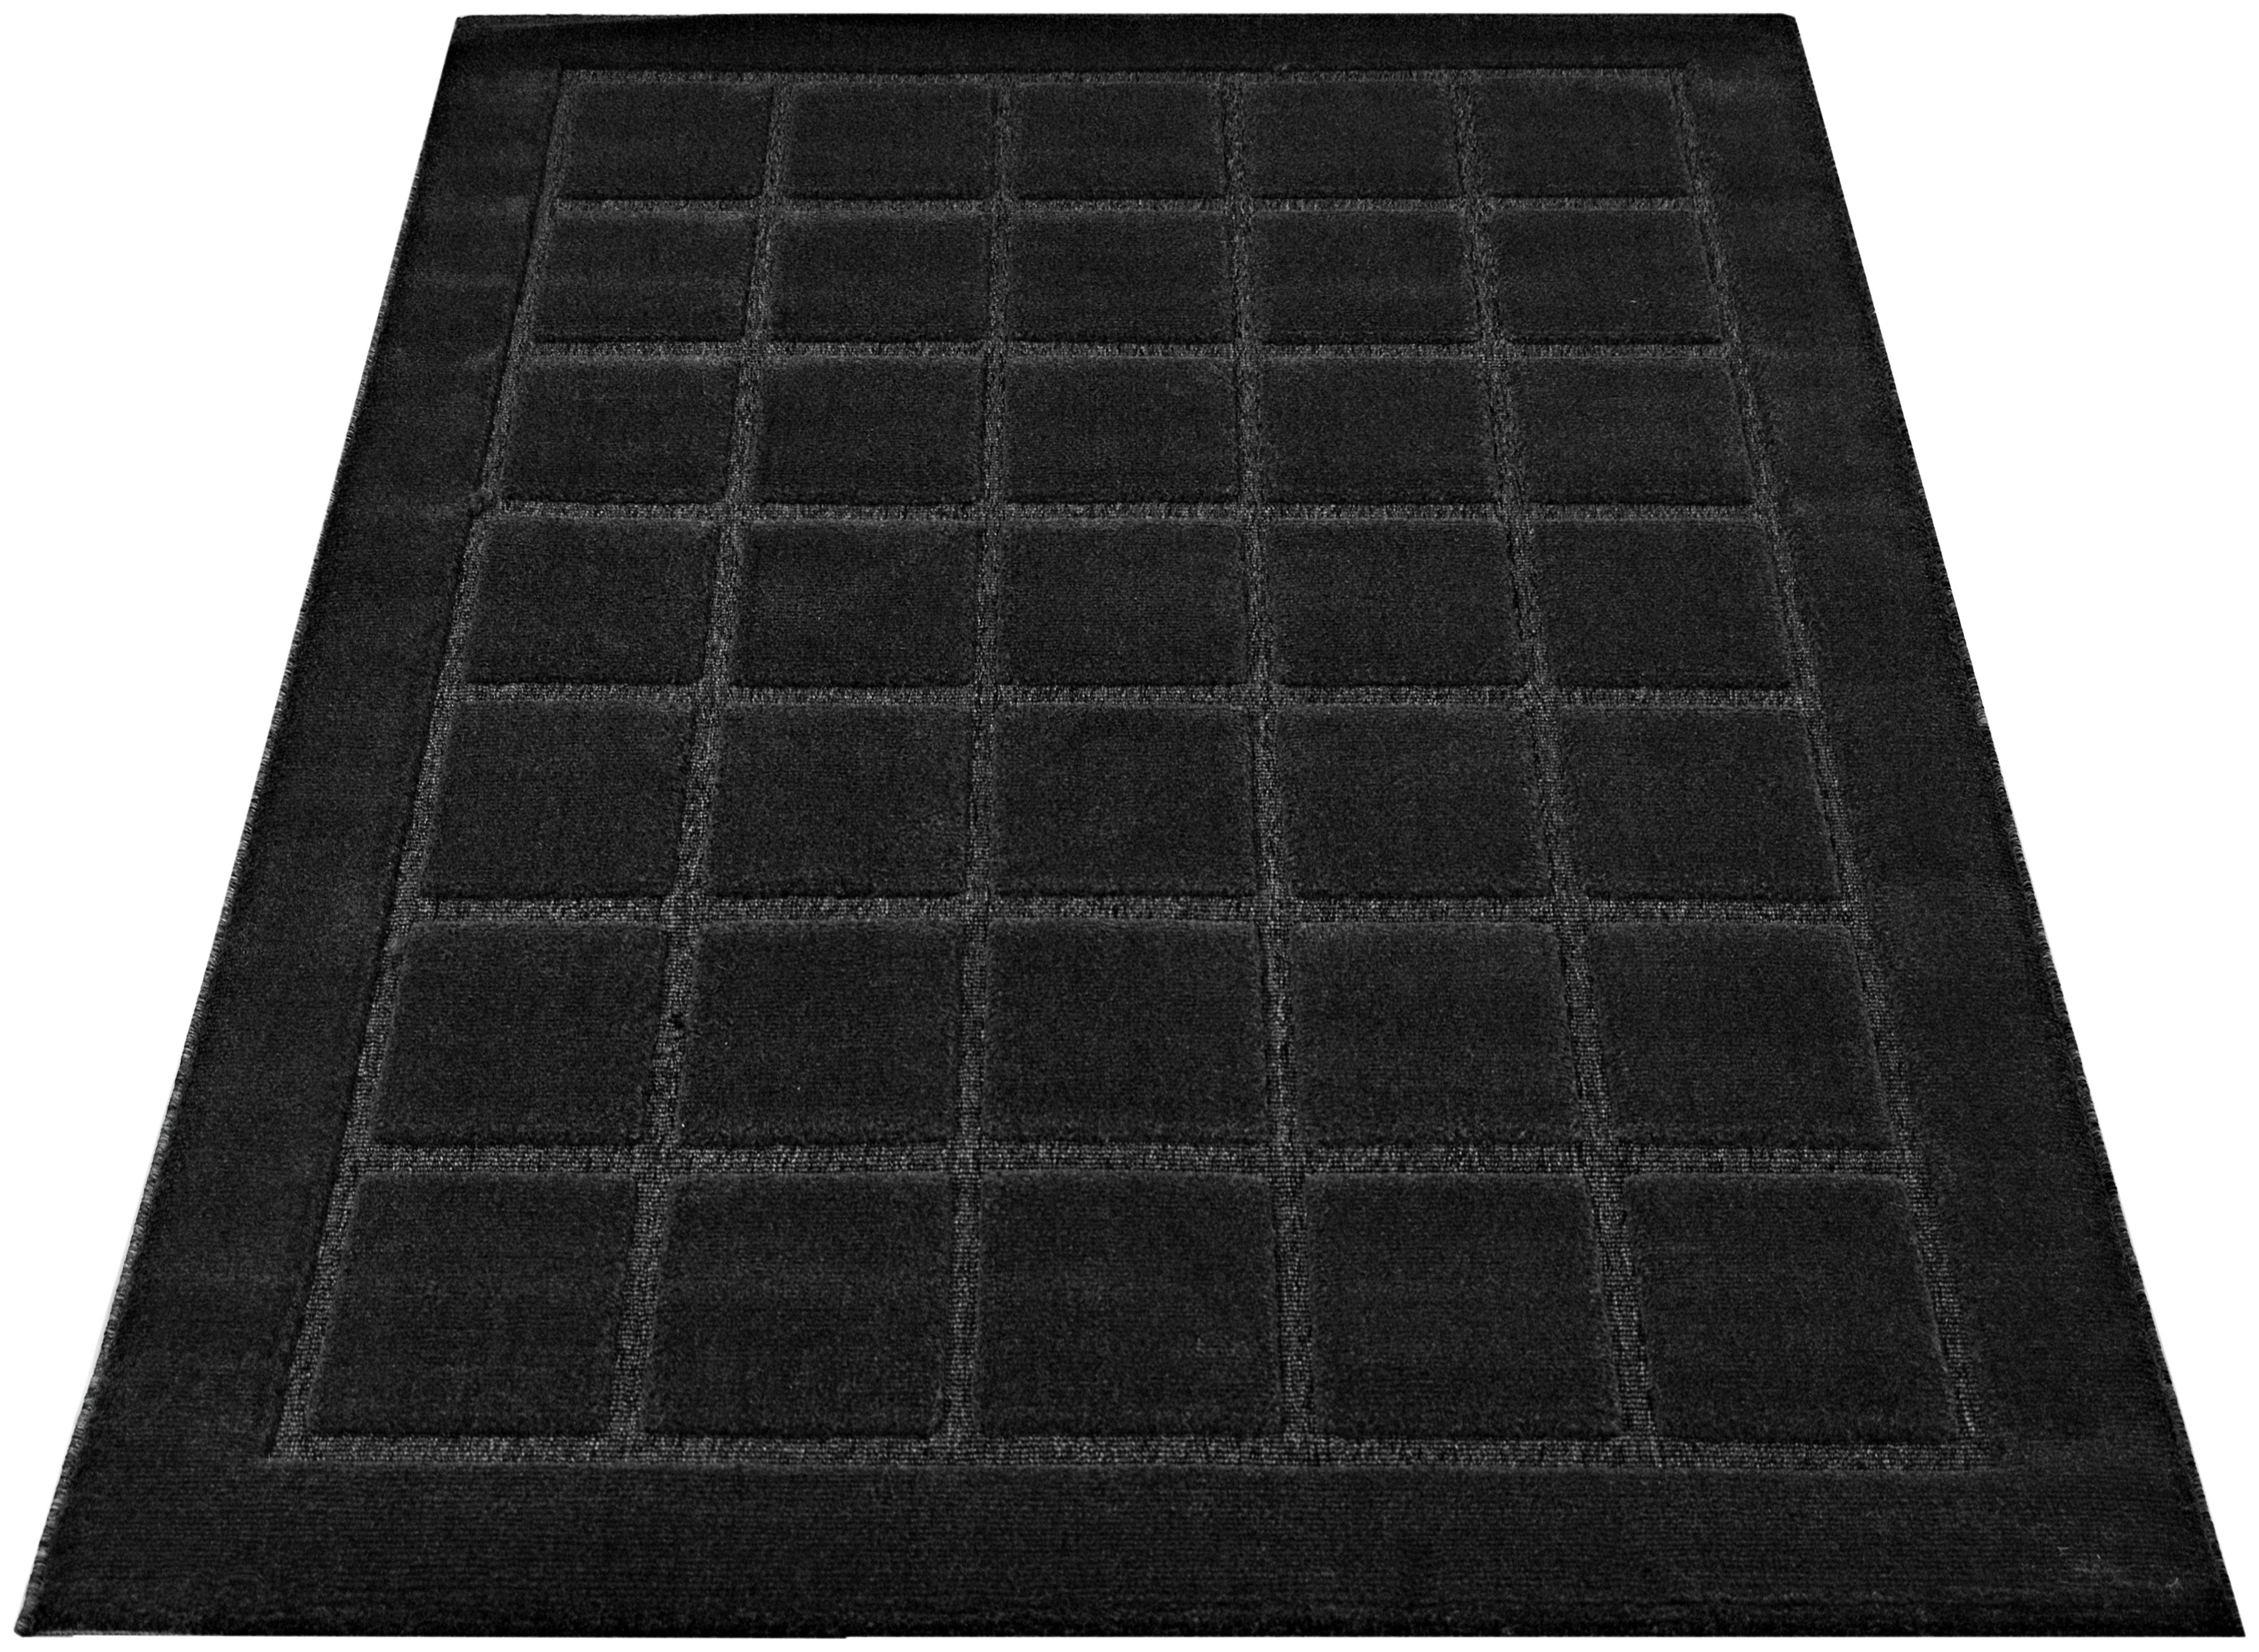 verona blocks rug 60x110cm anthracite. Black Bedroom Furniture Sets. Home Design Ideas